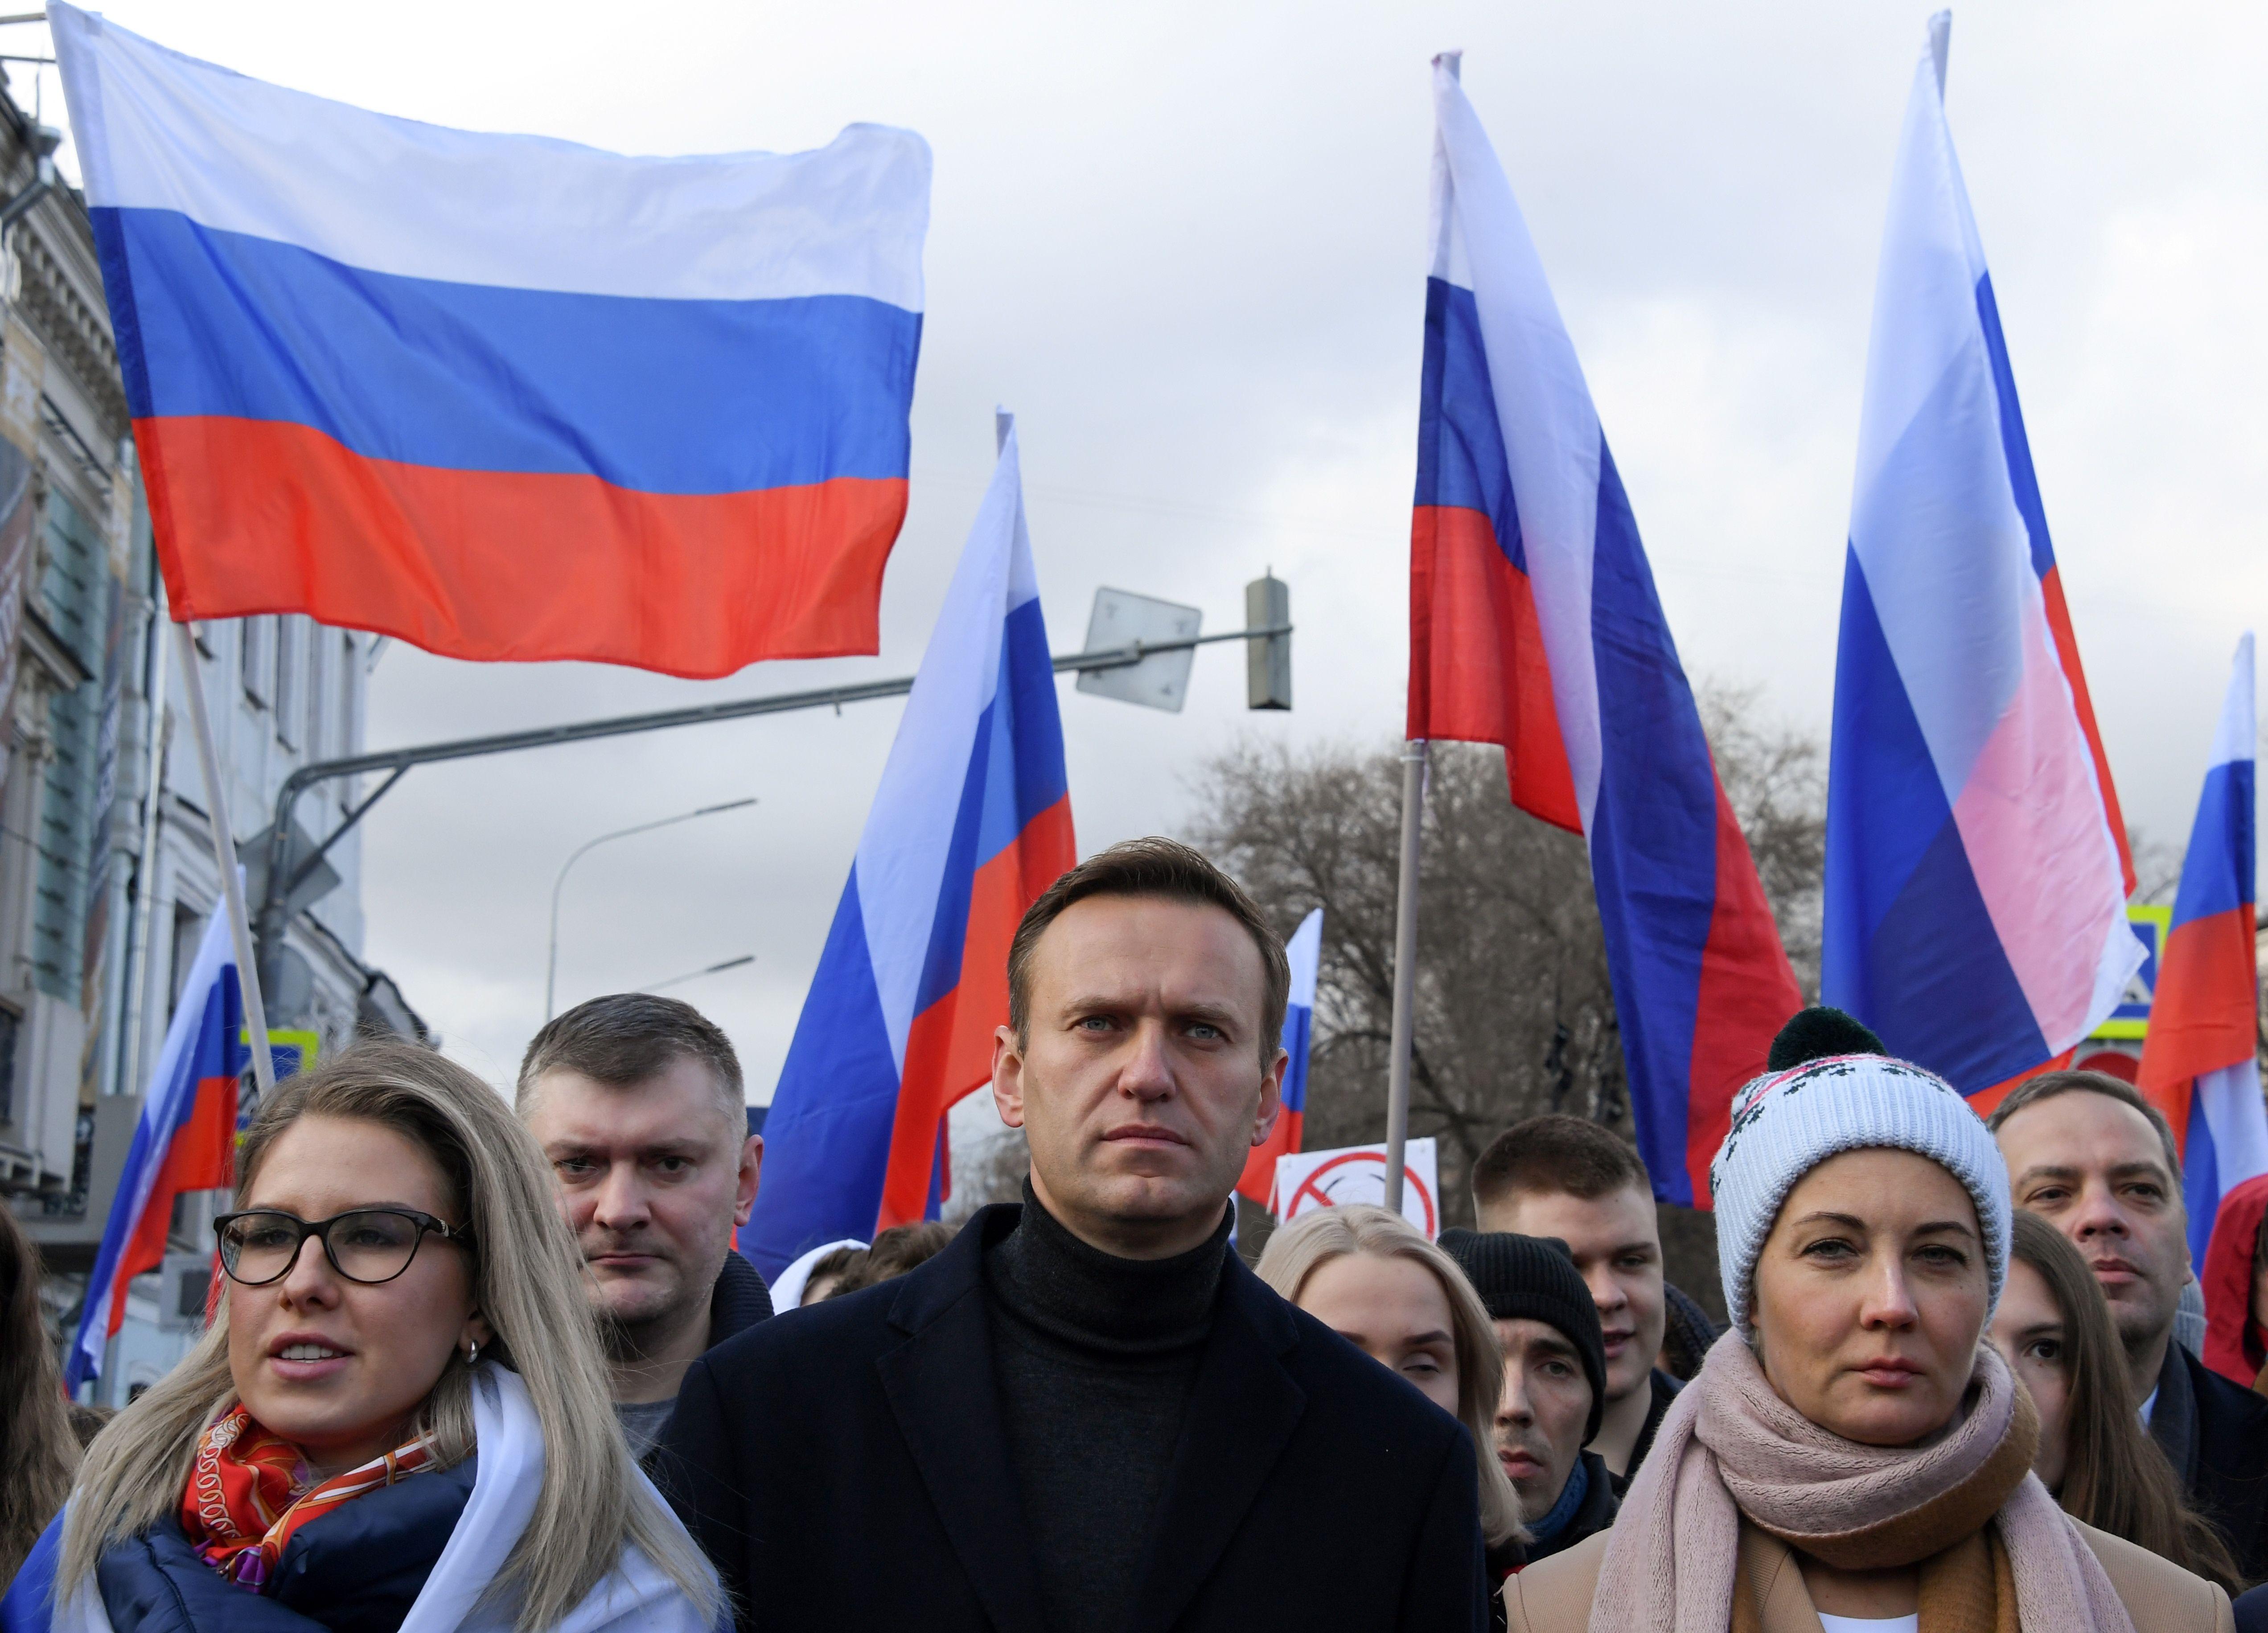 Rusia: en peligro la salud y la vida de aleksei navalny